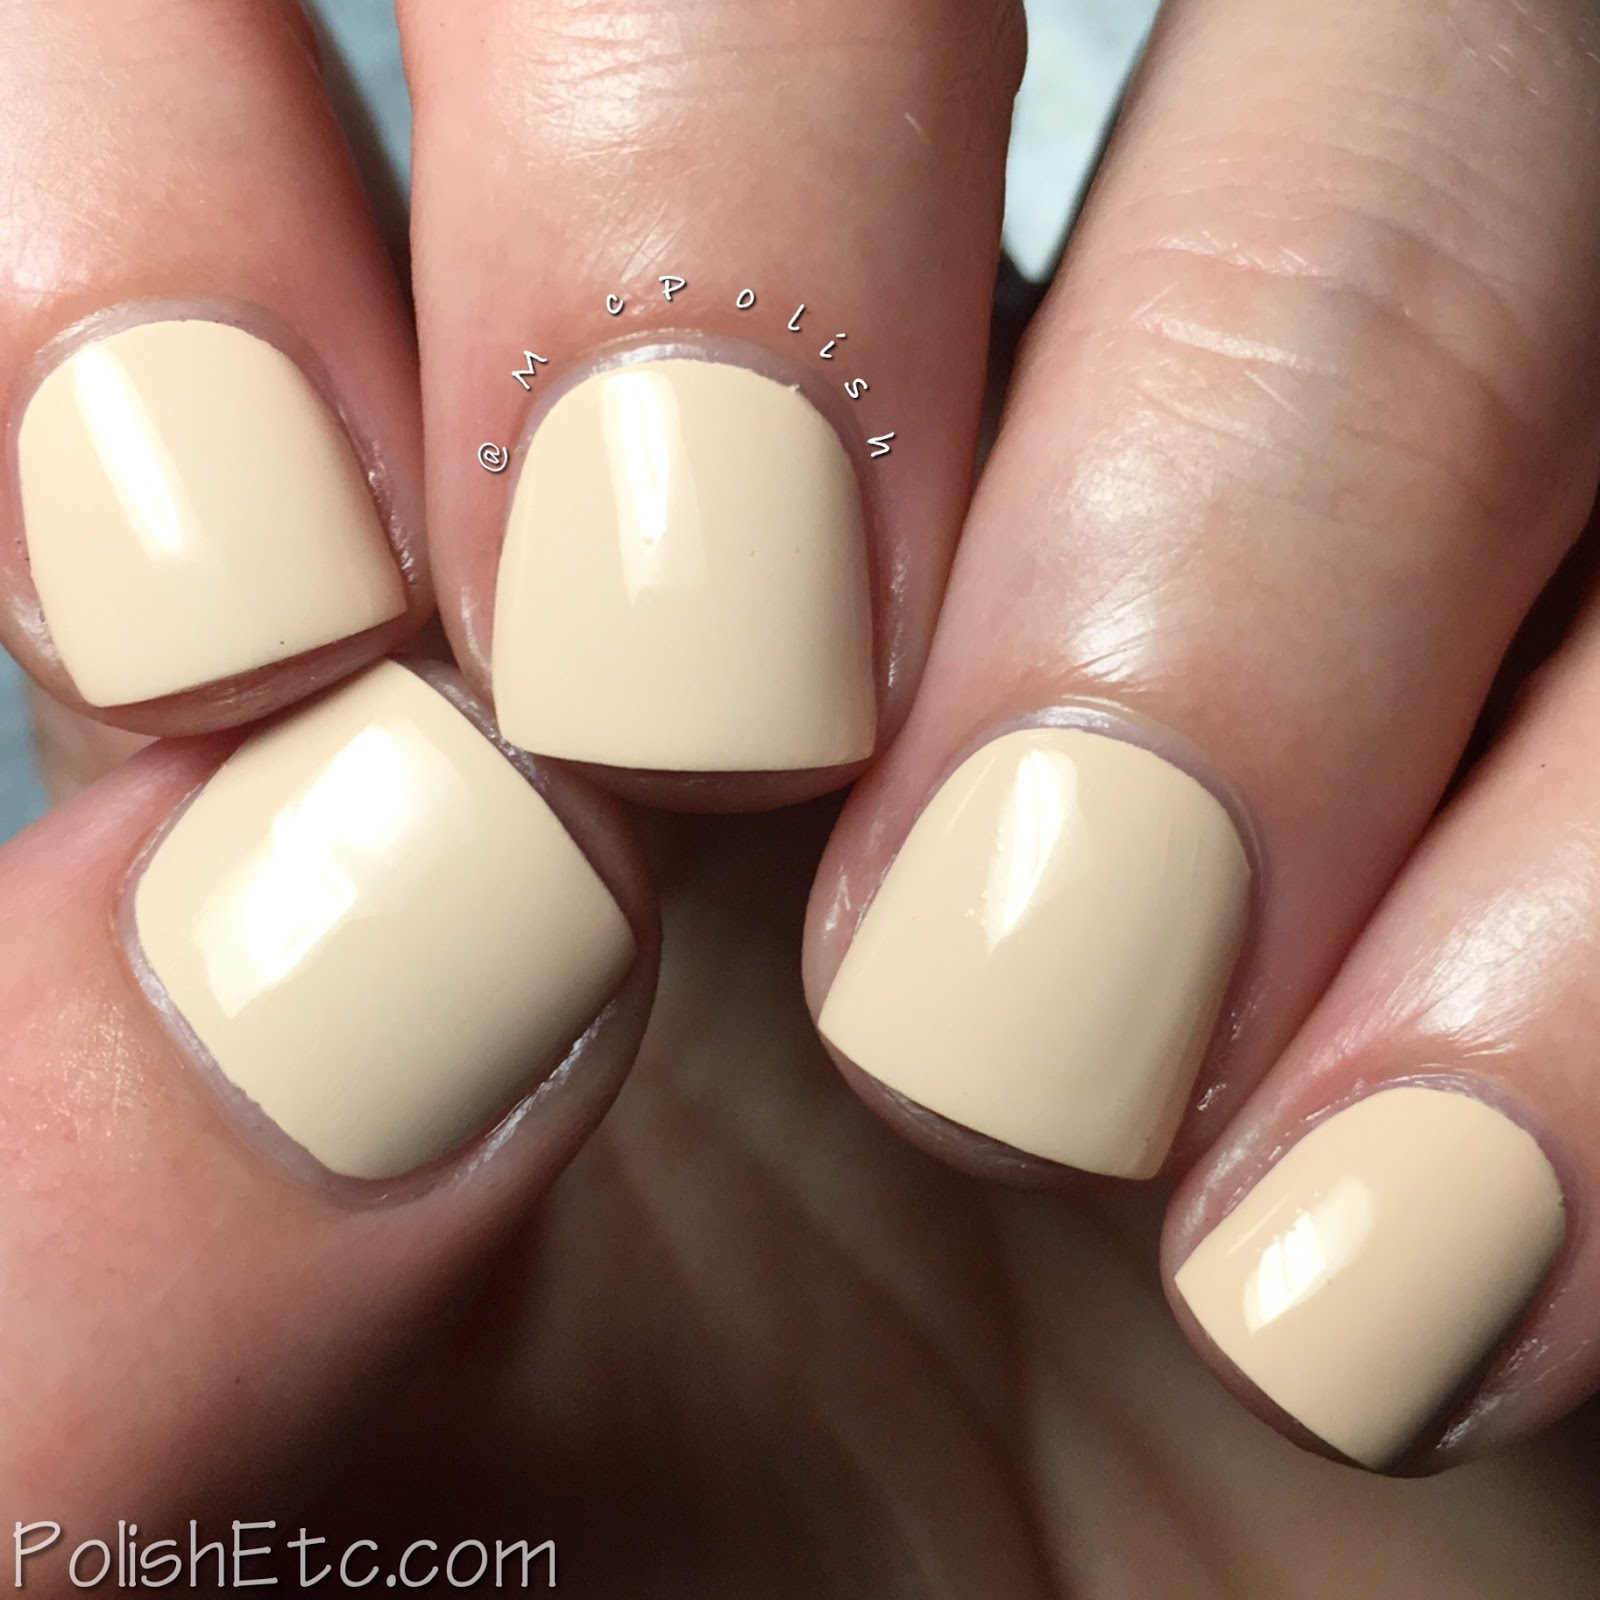 Pacifica - Nudes Nail Set - Polish Etc.